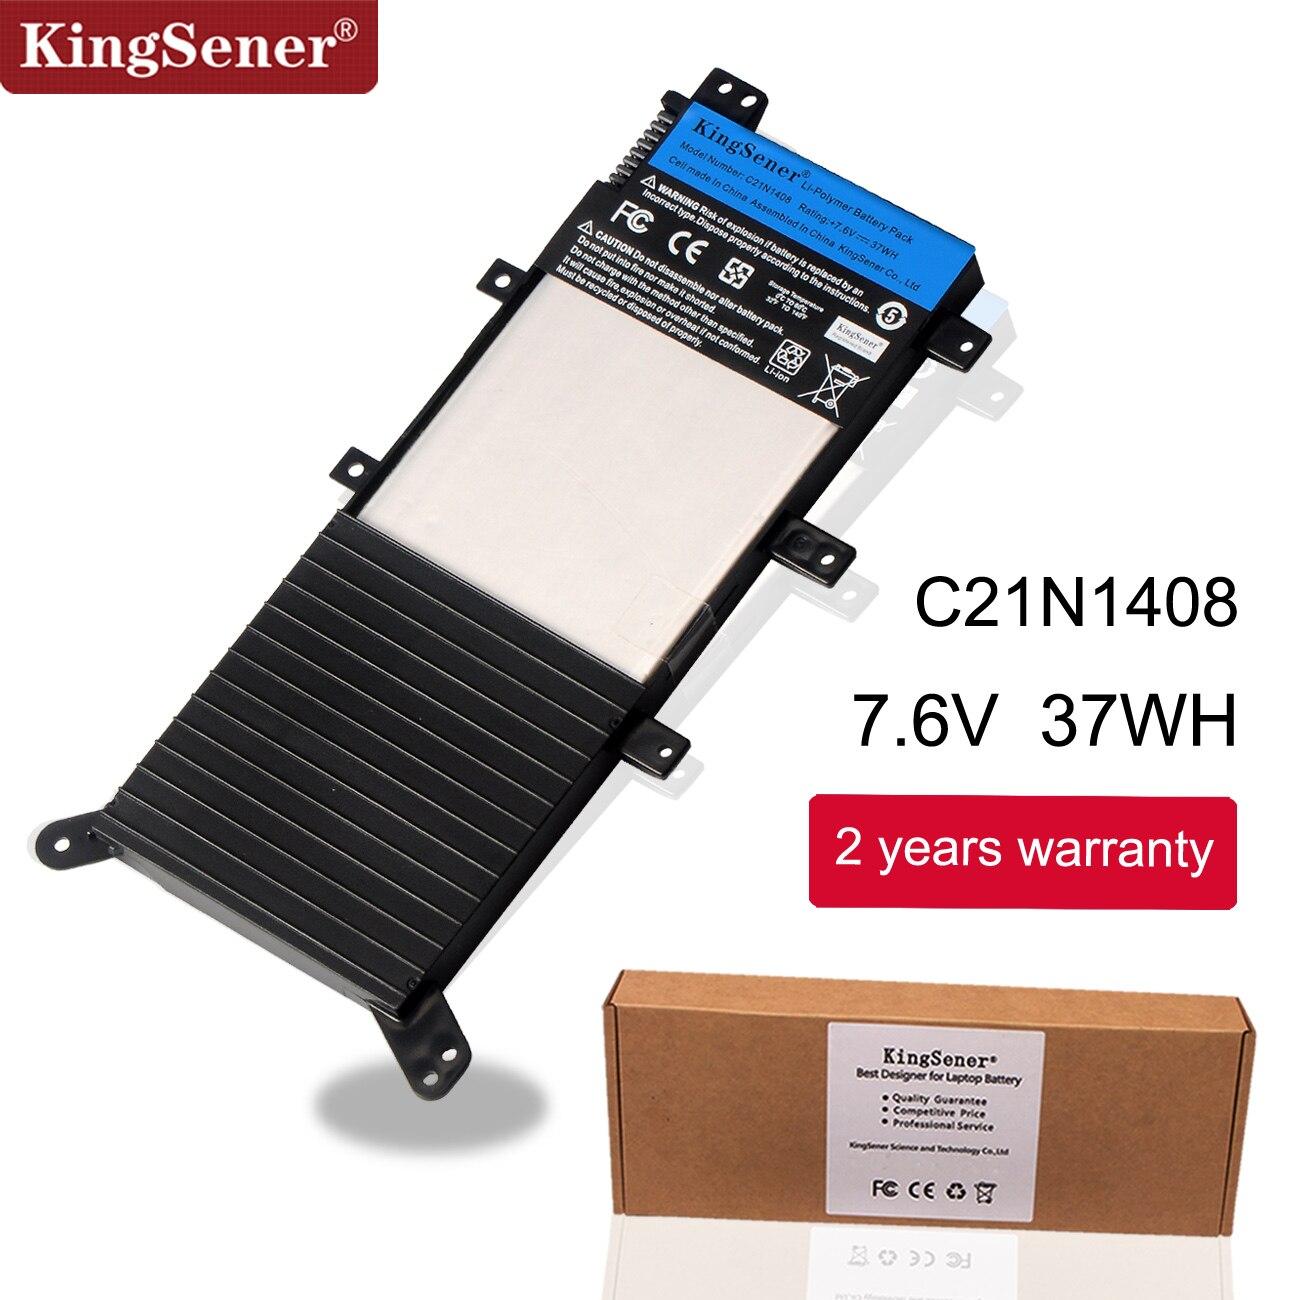 c21n1408 купить - KingSener New C21N1408 Laptop Battery For ASUS VivoBook 4000 MX555 V555L V555LB V555U Series 7.6V 37WH Free 2 Years Warranty